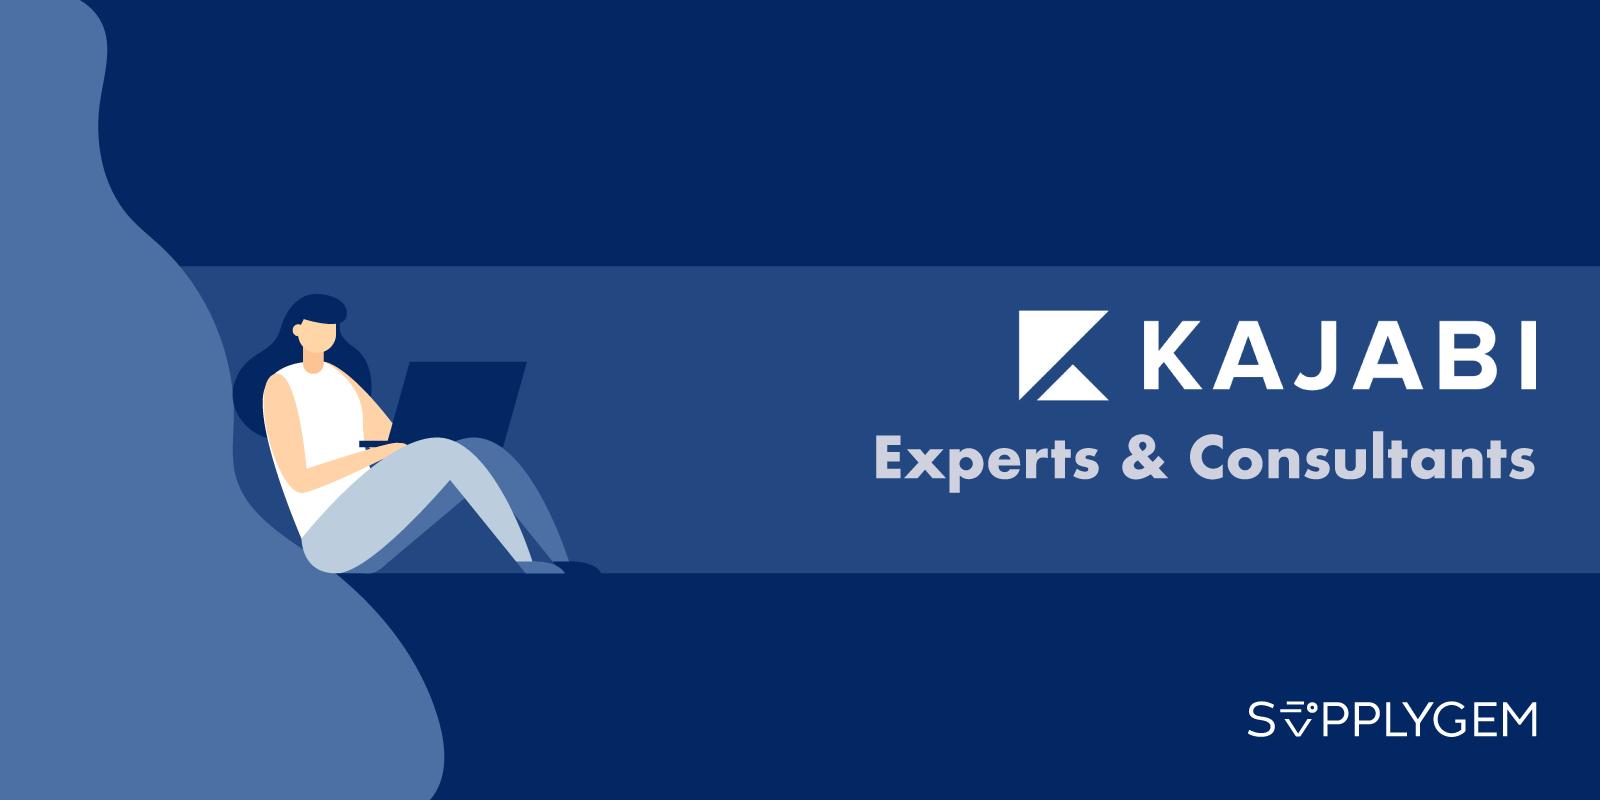 Kajabi Experts & Consultants